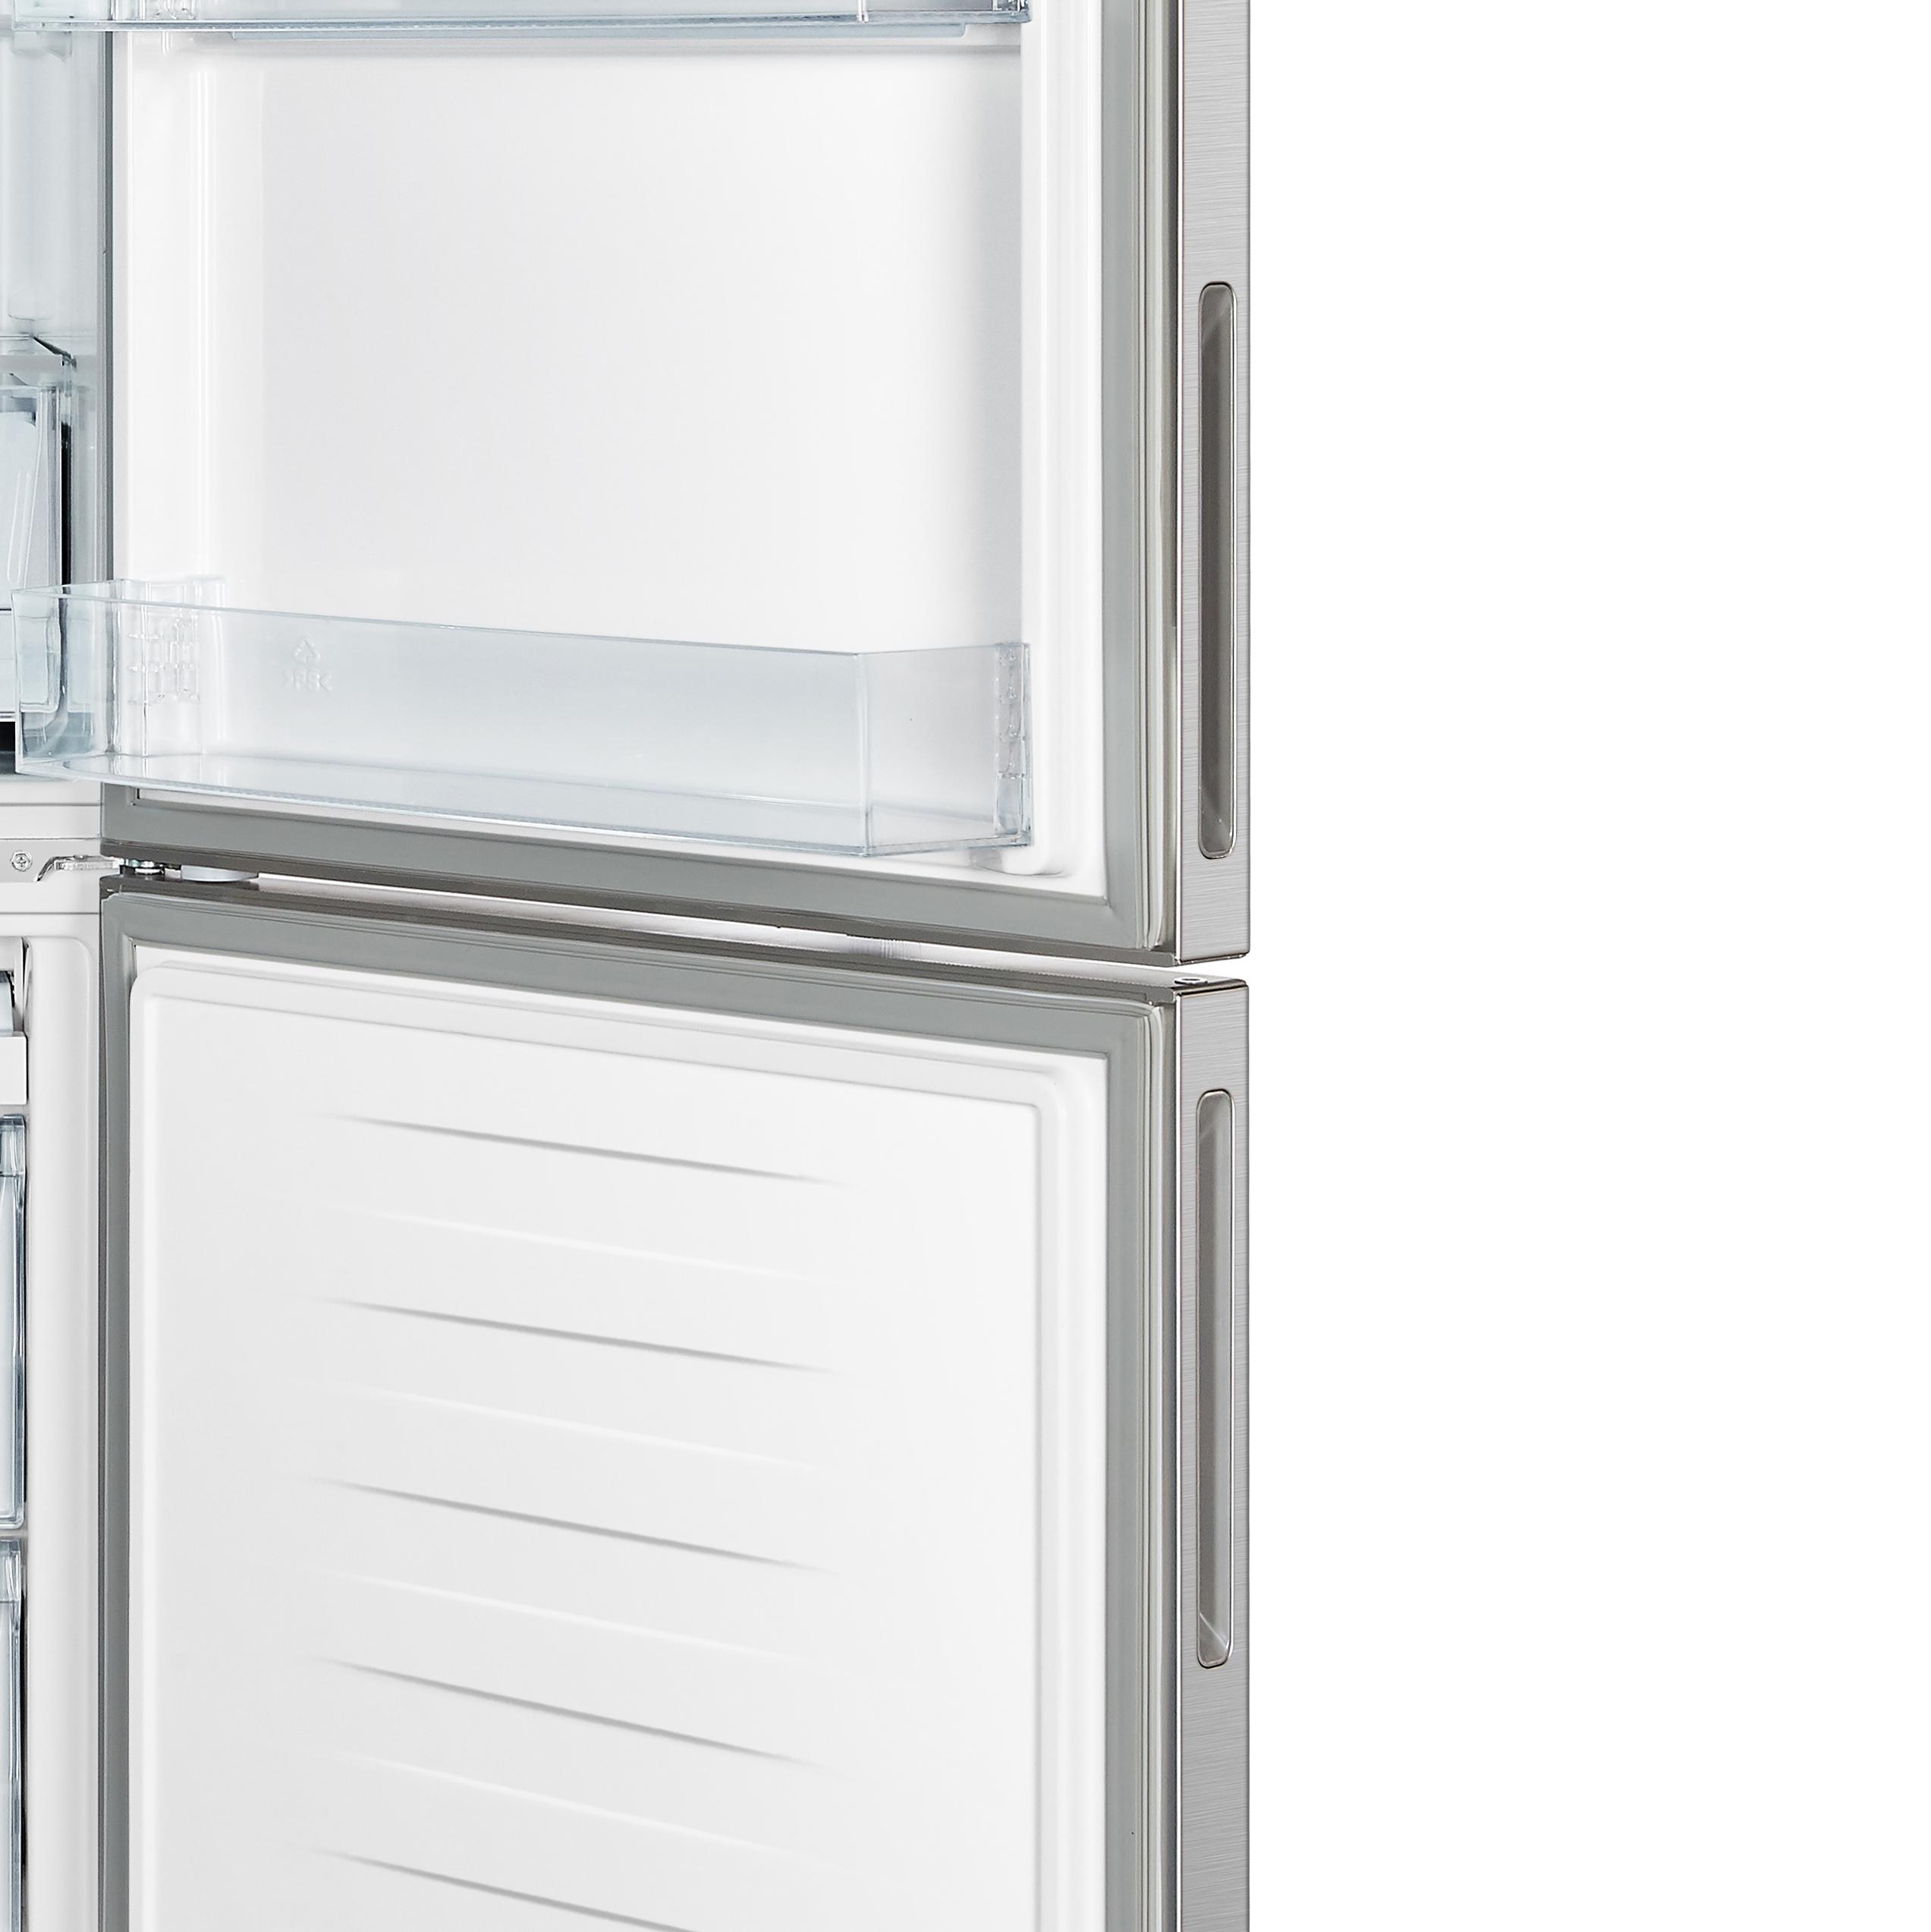 14 8 cu ft  Stainless Counter-Depth Bottom Mount Freezer